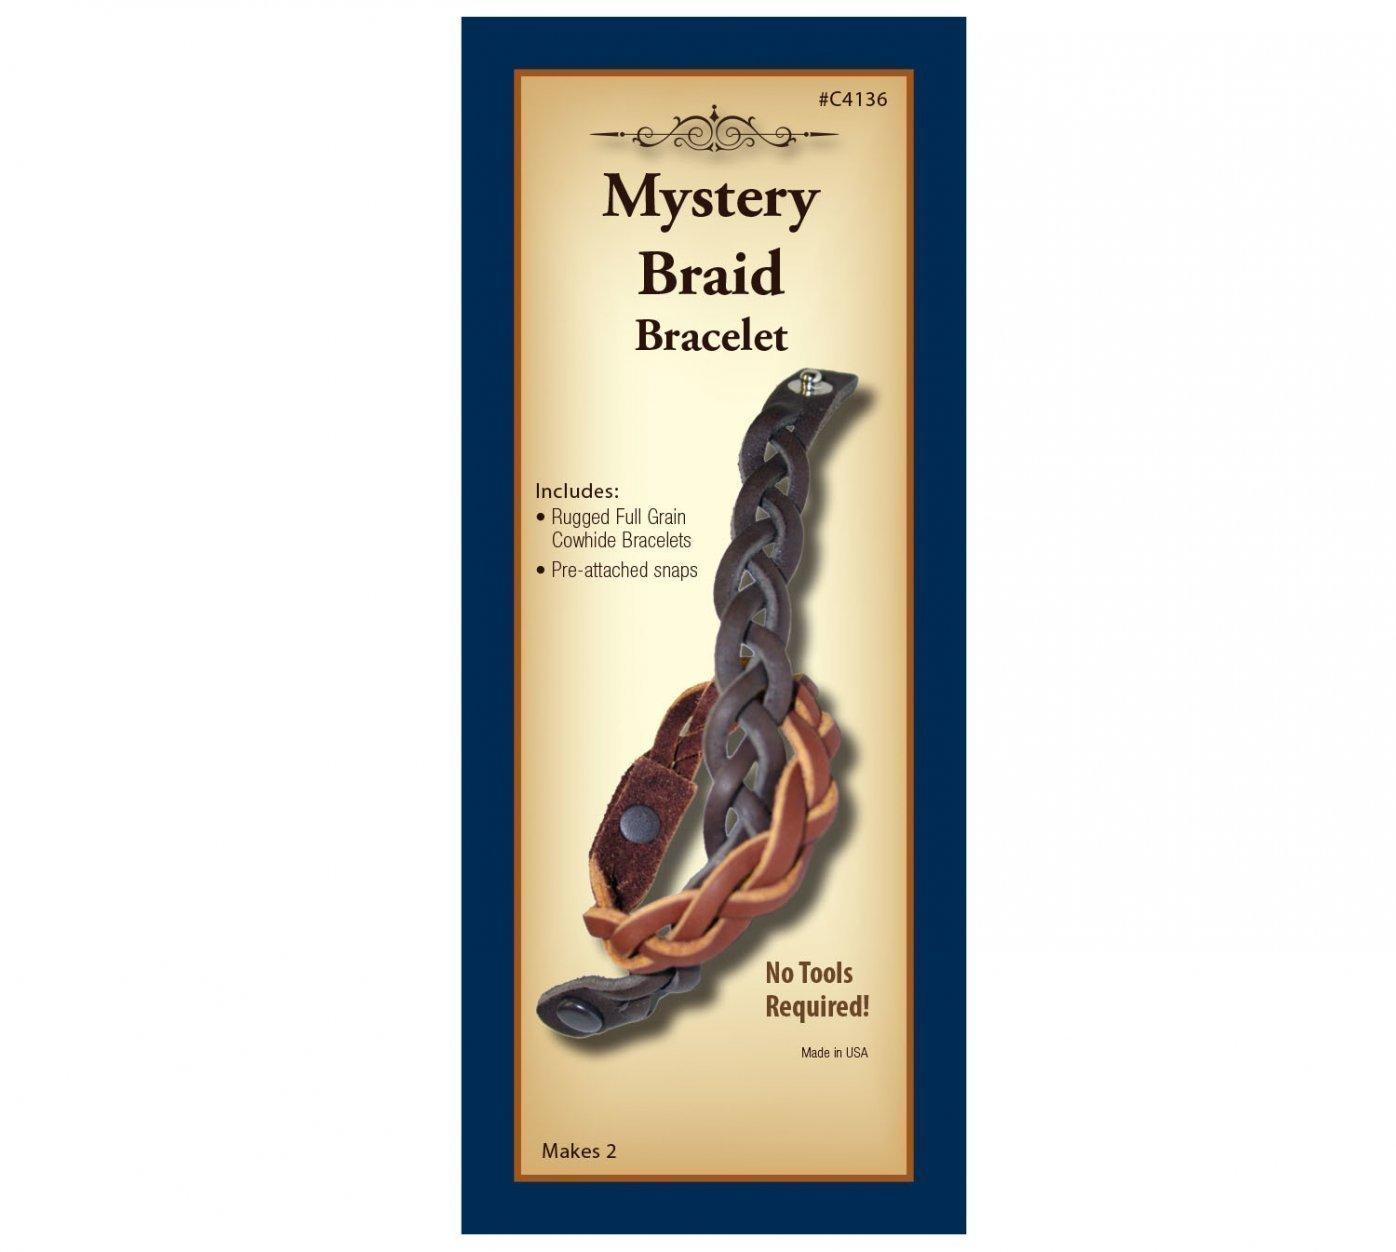 Mystery Braid Bracelet C4136 02 Montana Leather Company